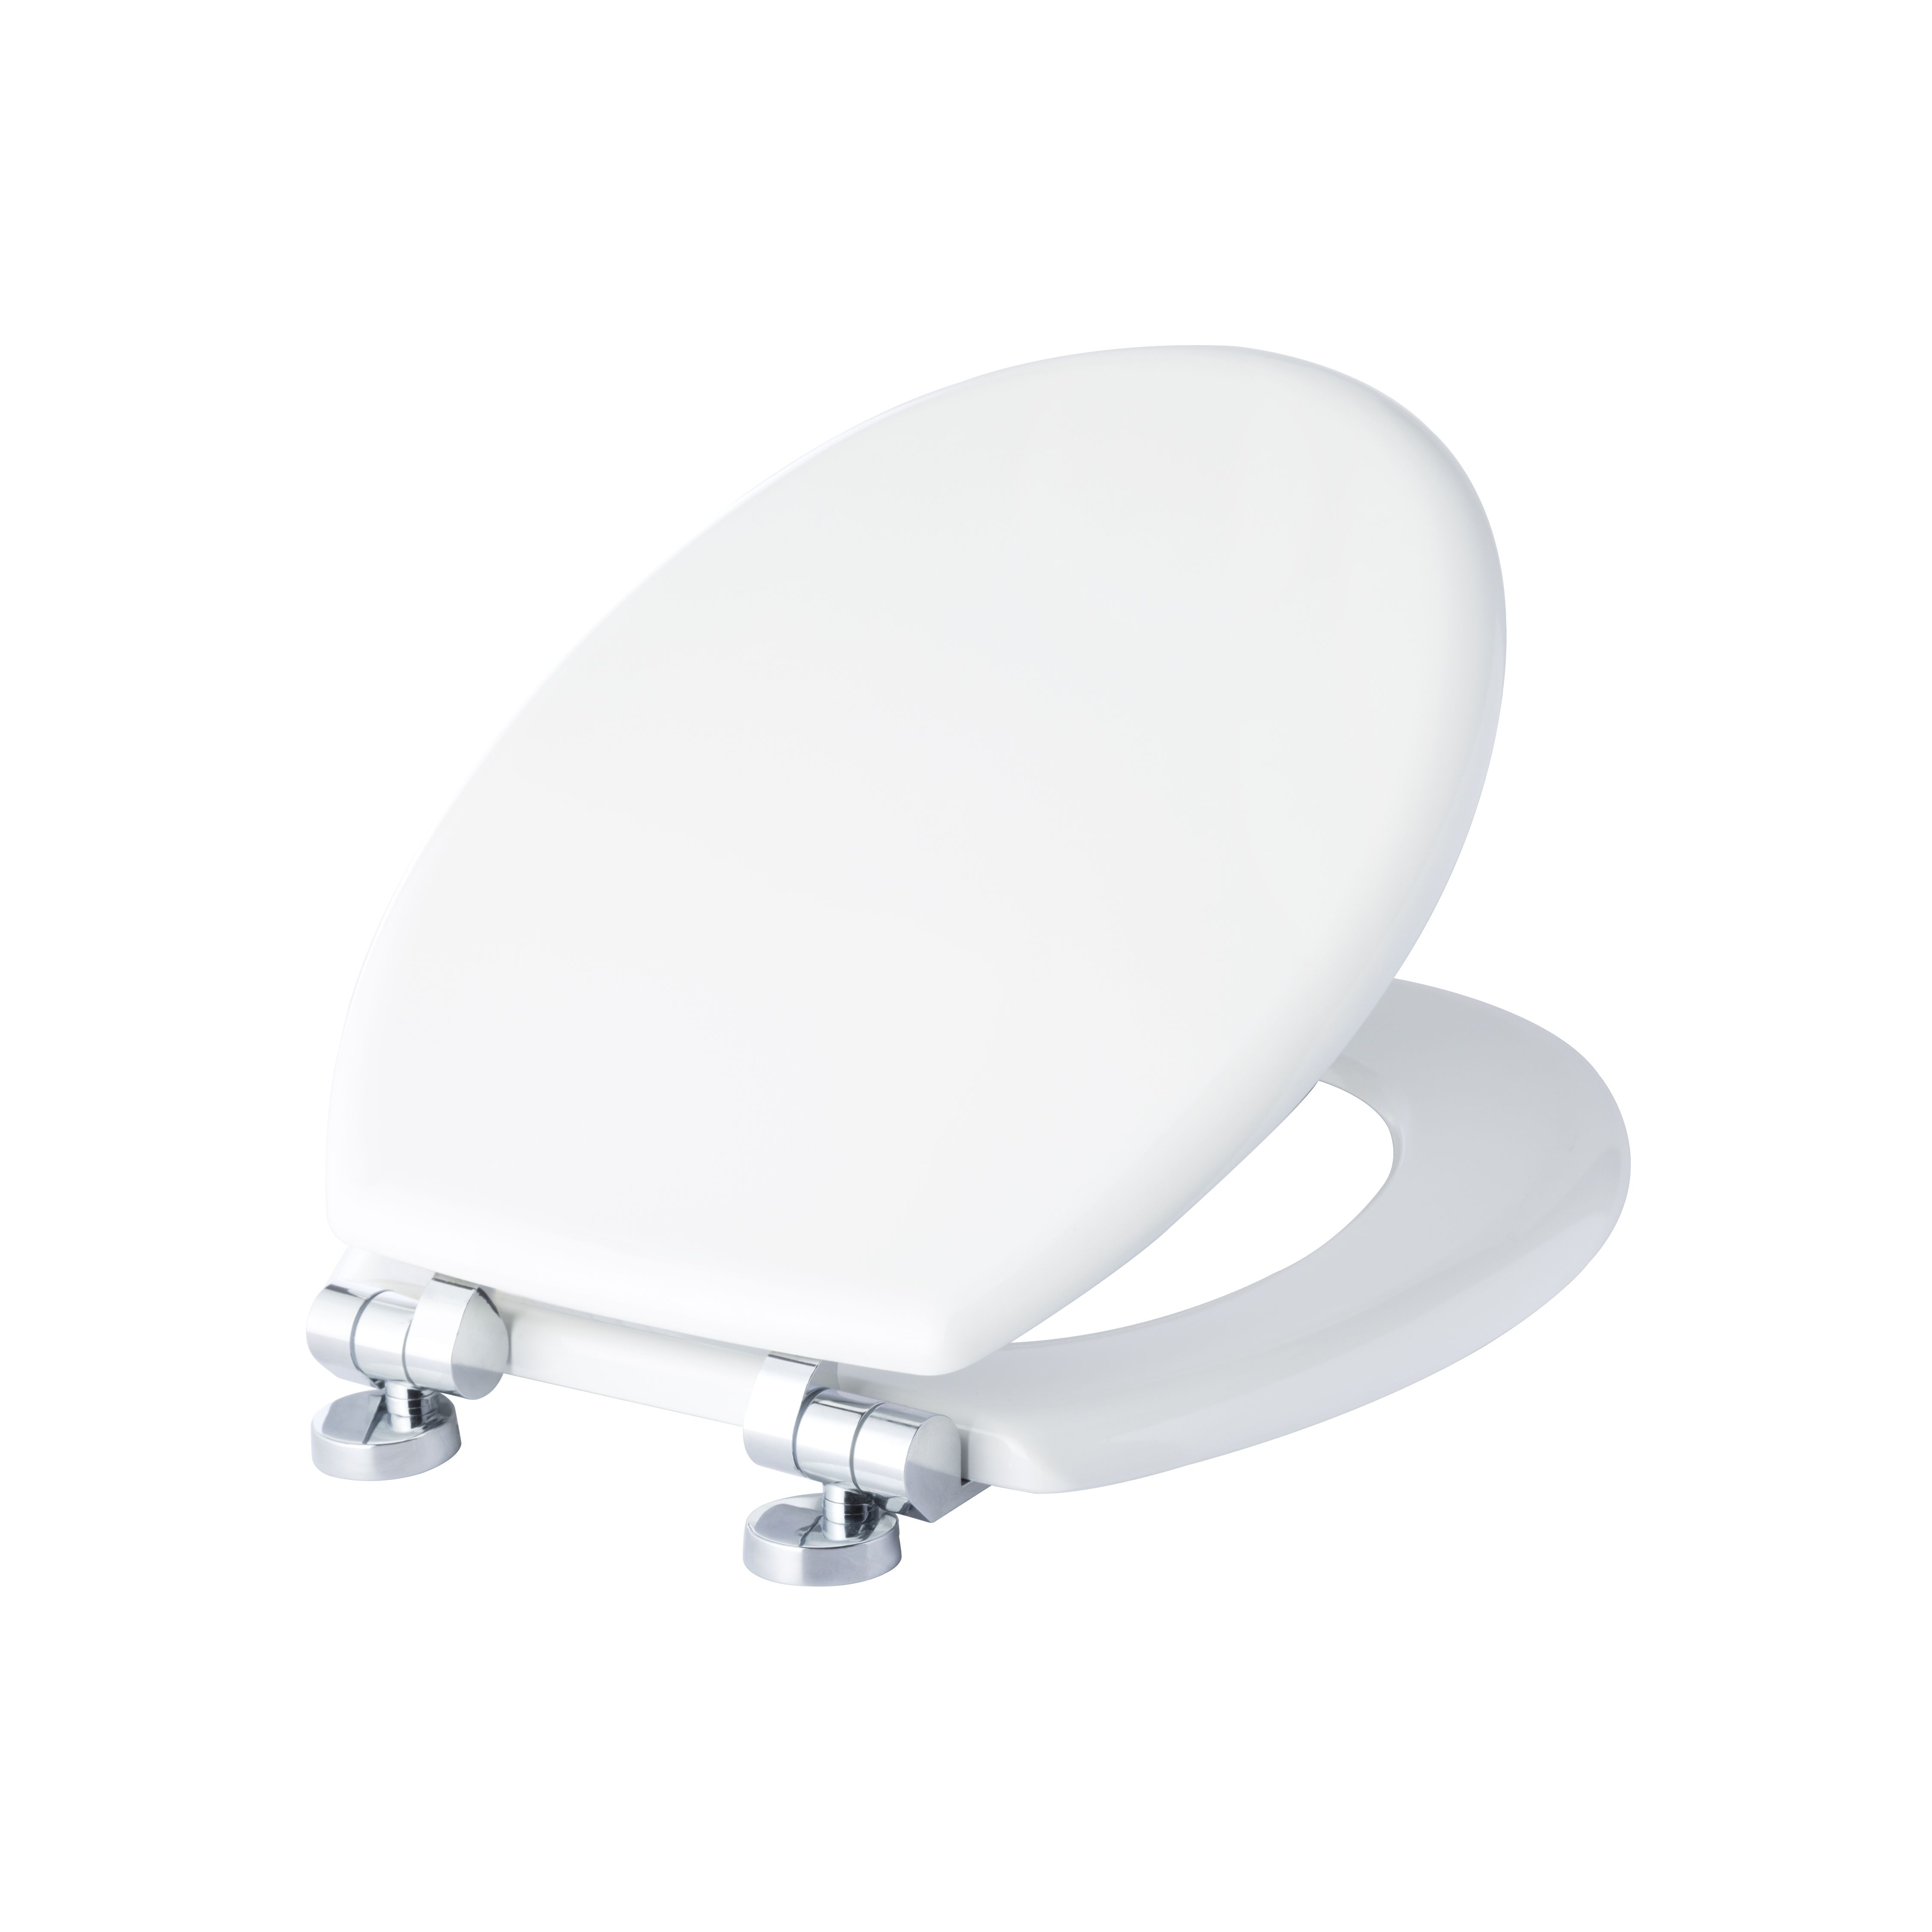 Stupendous Bemis Hartford White Painted Wood Soft Close Toilet Seat Departments Diy At Bq Creativecarmelina Interior Chair Design Creativecarmelinacom